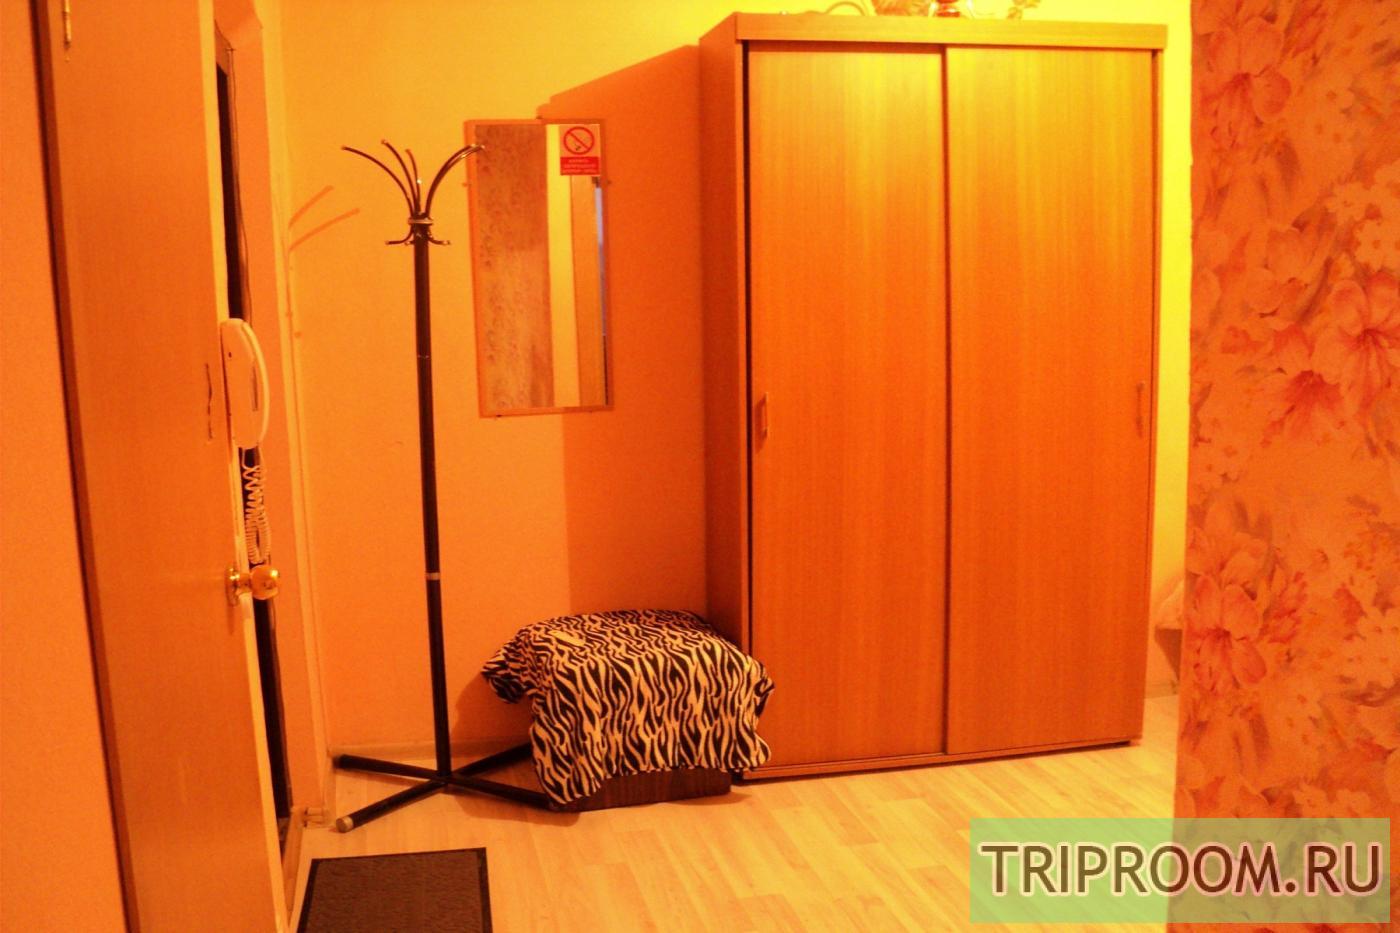 1-комнатная квартира посуточно (вариант № 5905), ул. Алексеева улица, фото № 9